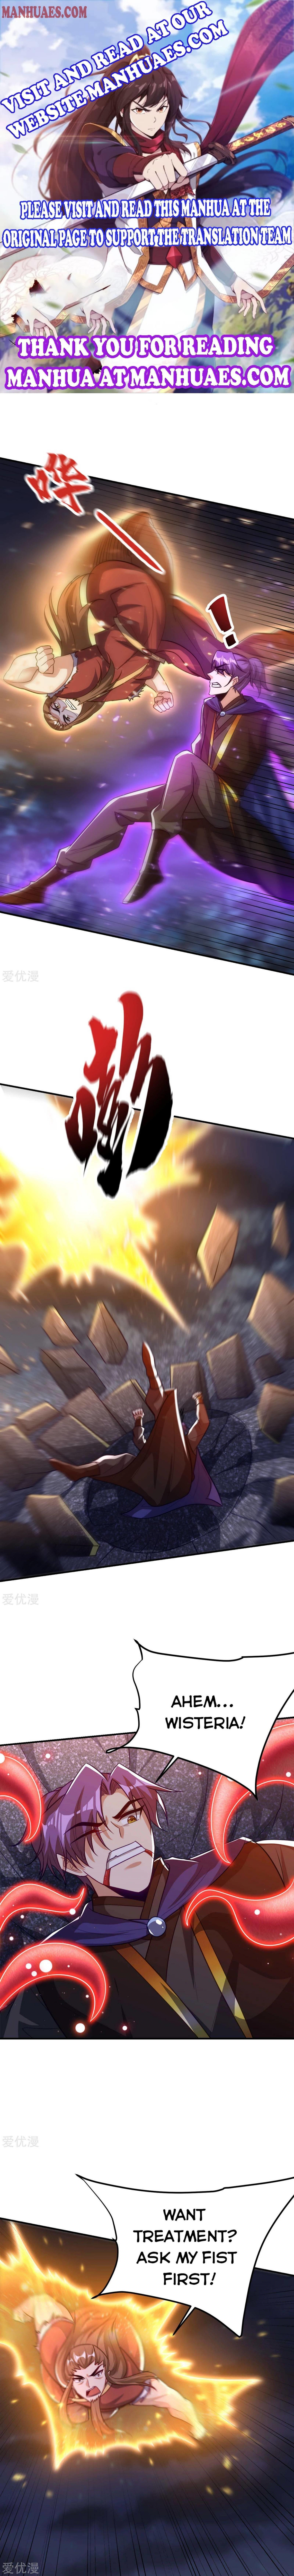 Rise Of The Demon King Chapter 210 page 1 - Mangakakalots.com